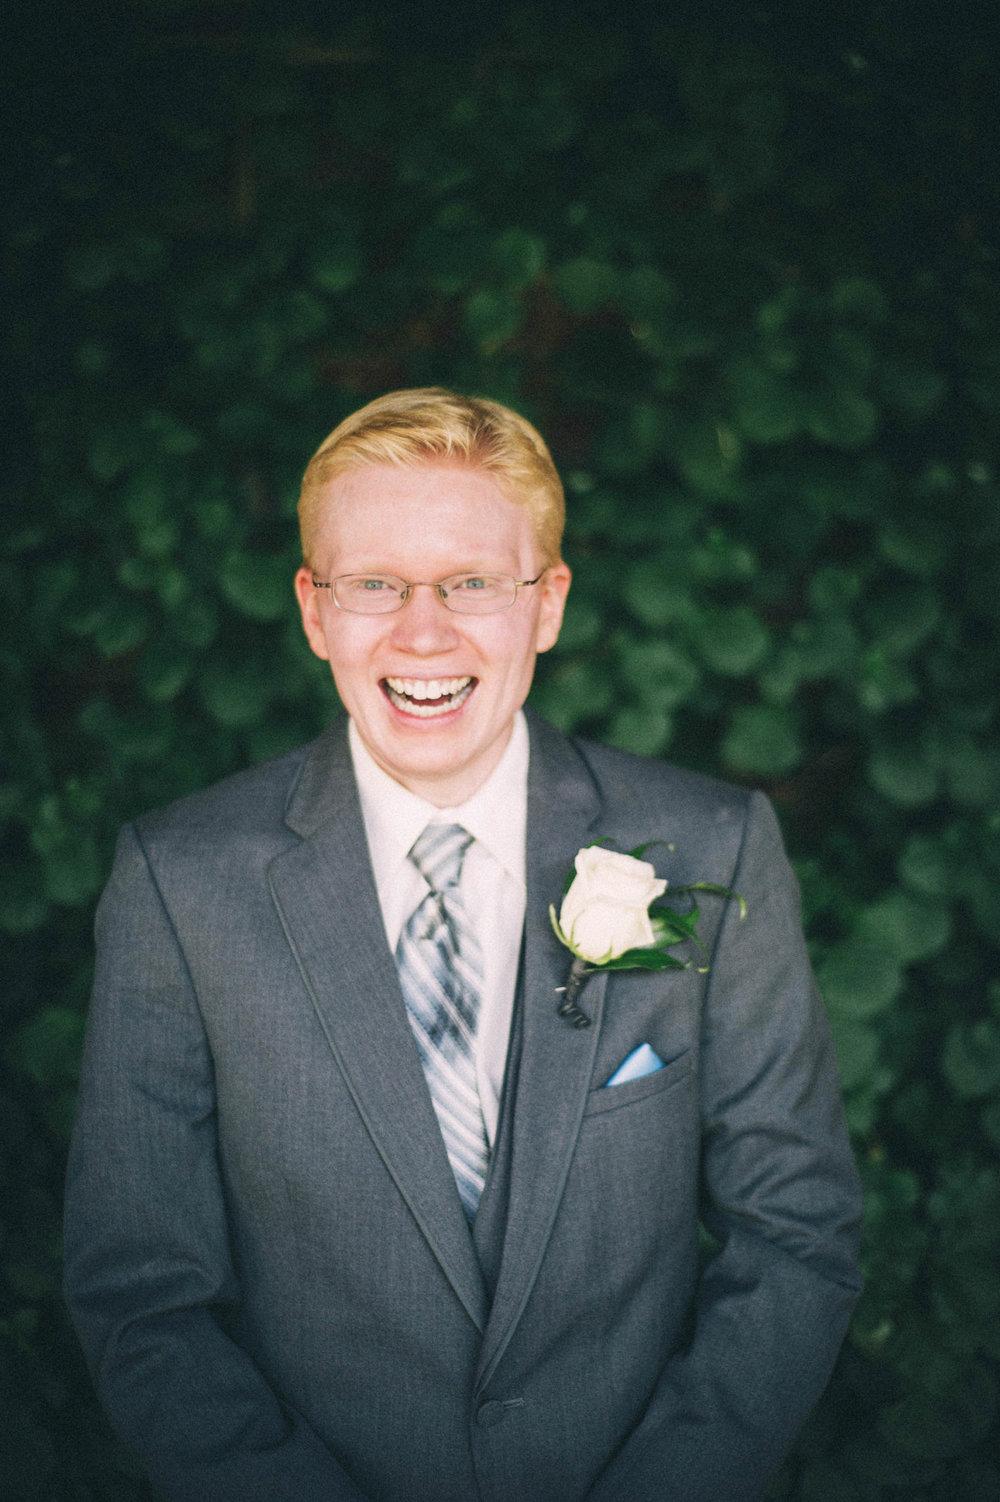 Jenna-Patrick-Garden-Court-Presbyterian-Seminary-Wedding-Louisville-Kentucky-Sarah-Katherine-Davis-Photography-39.jpg